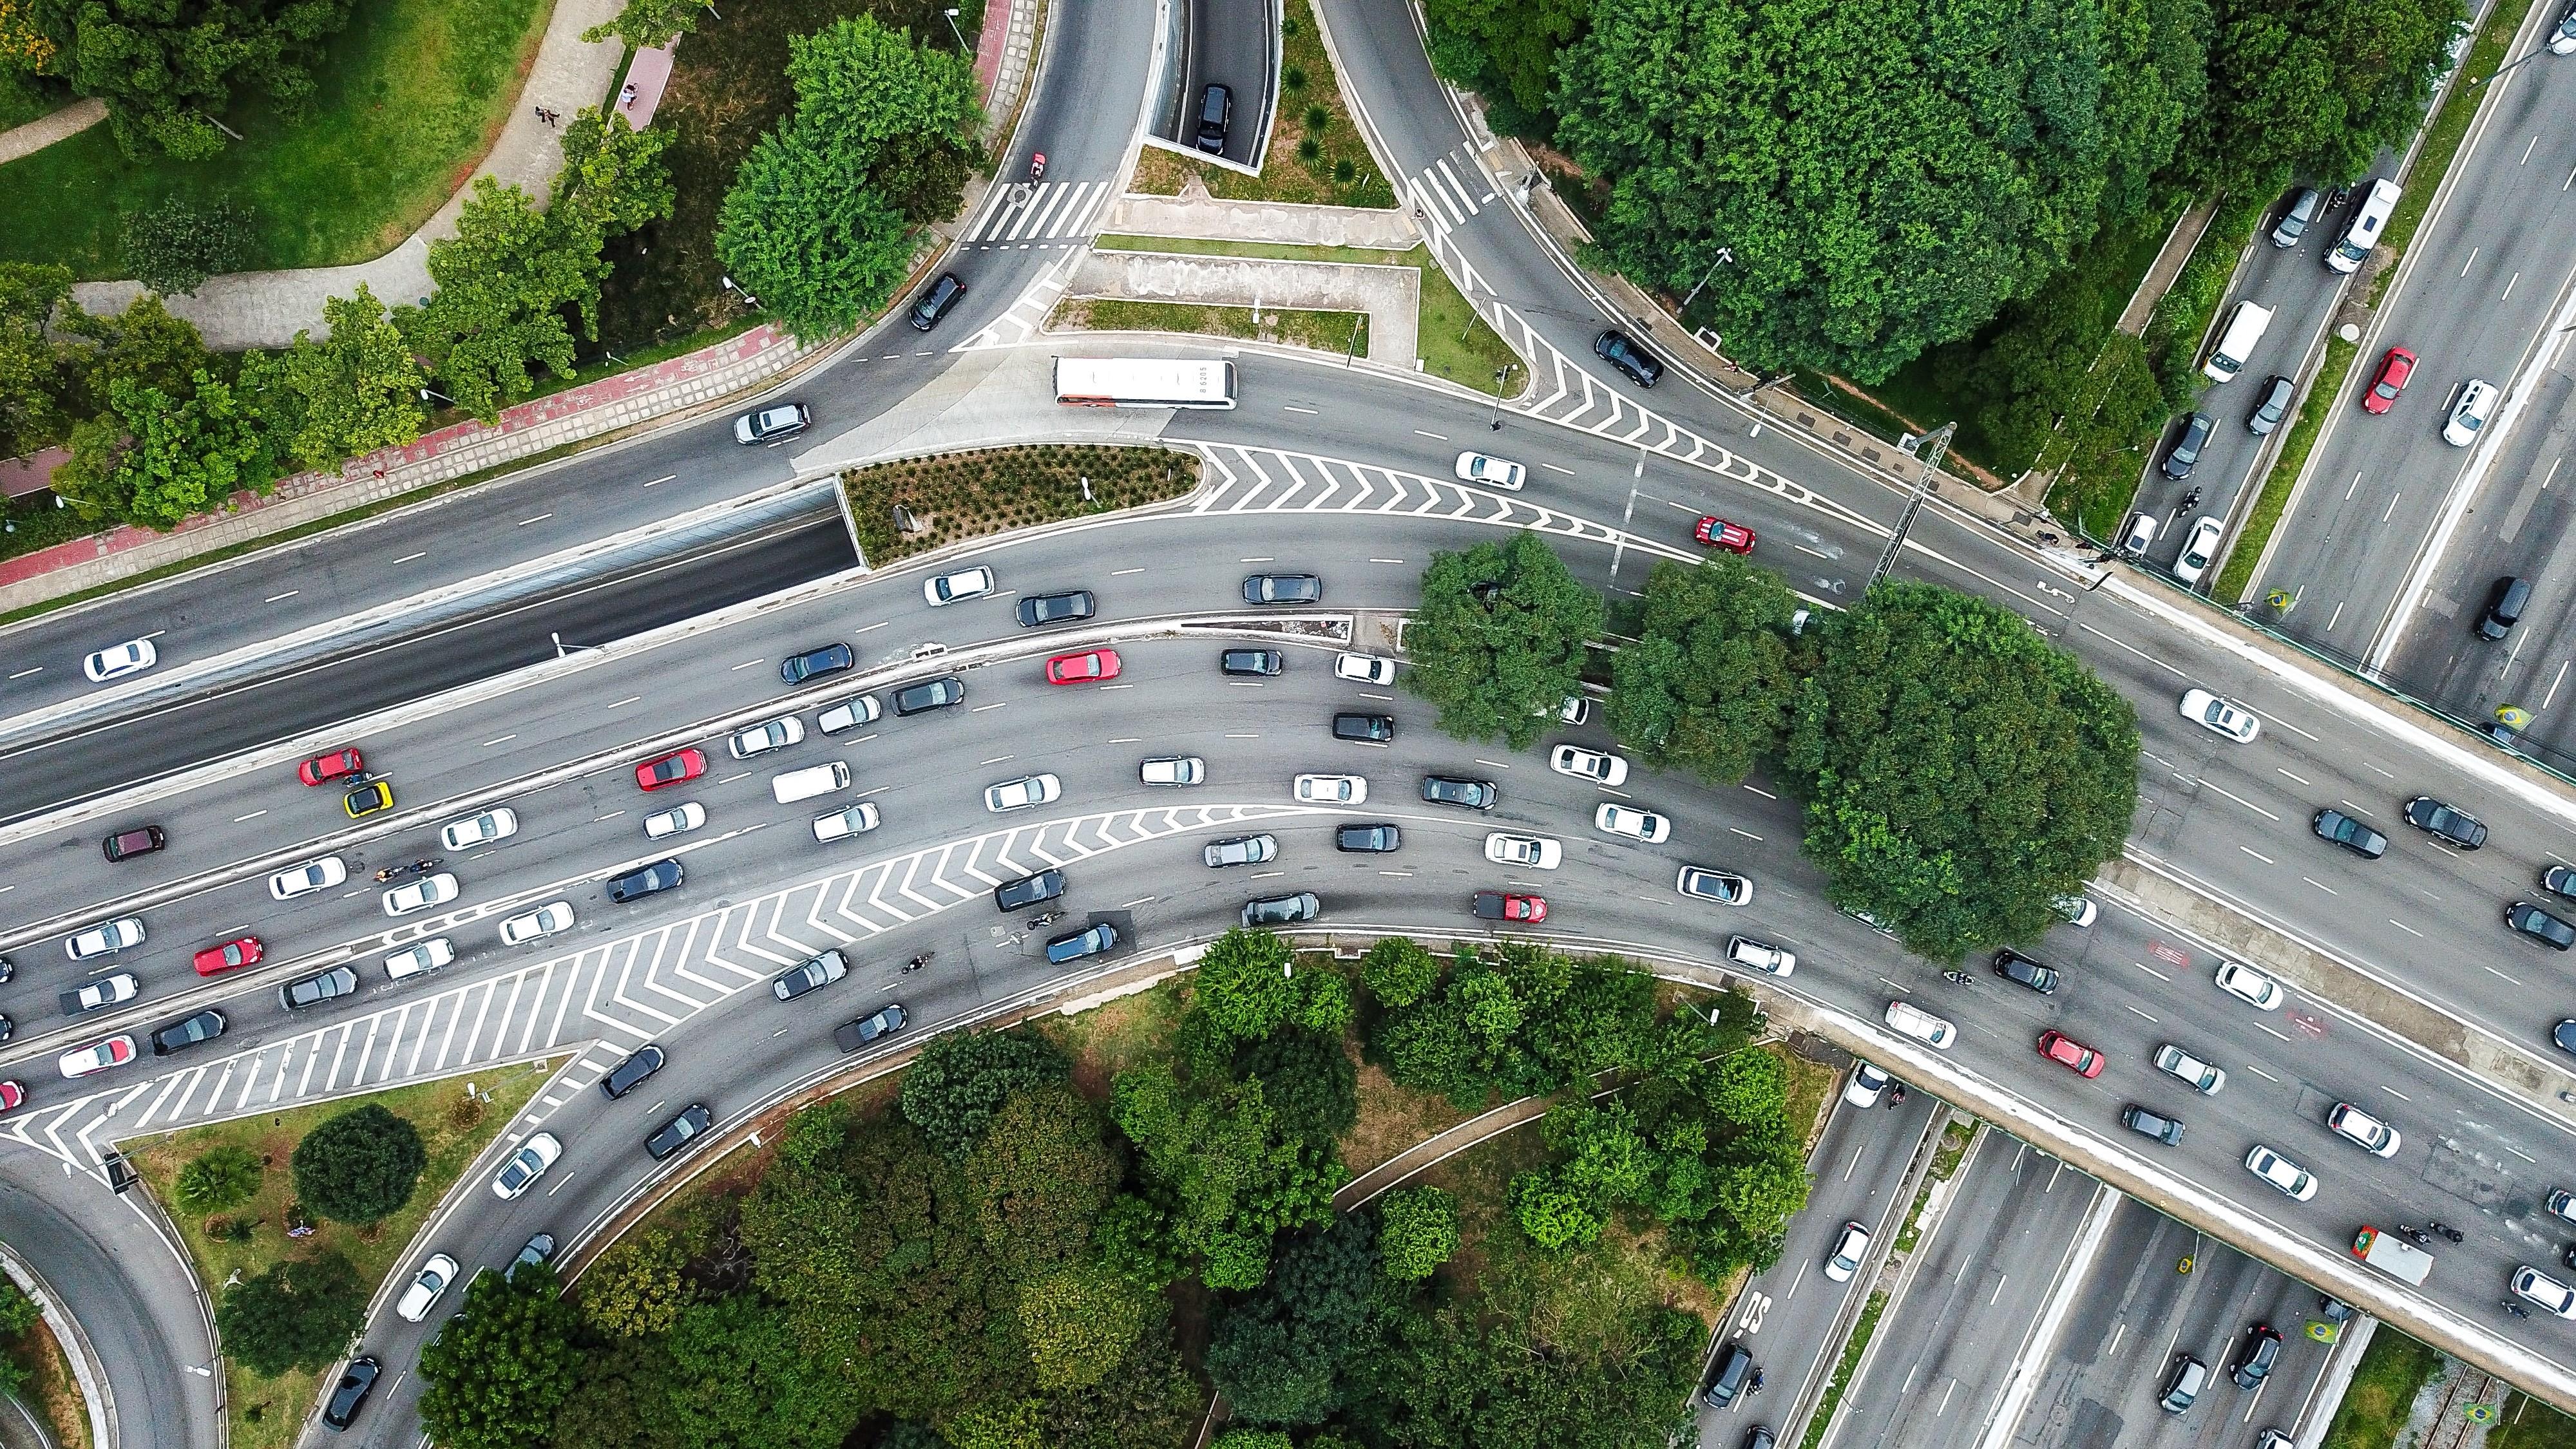 aerial view - traffic